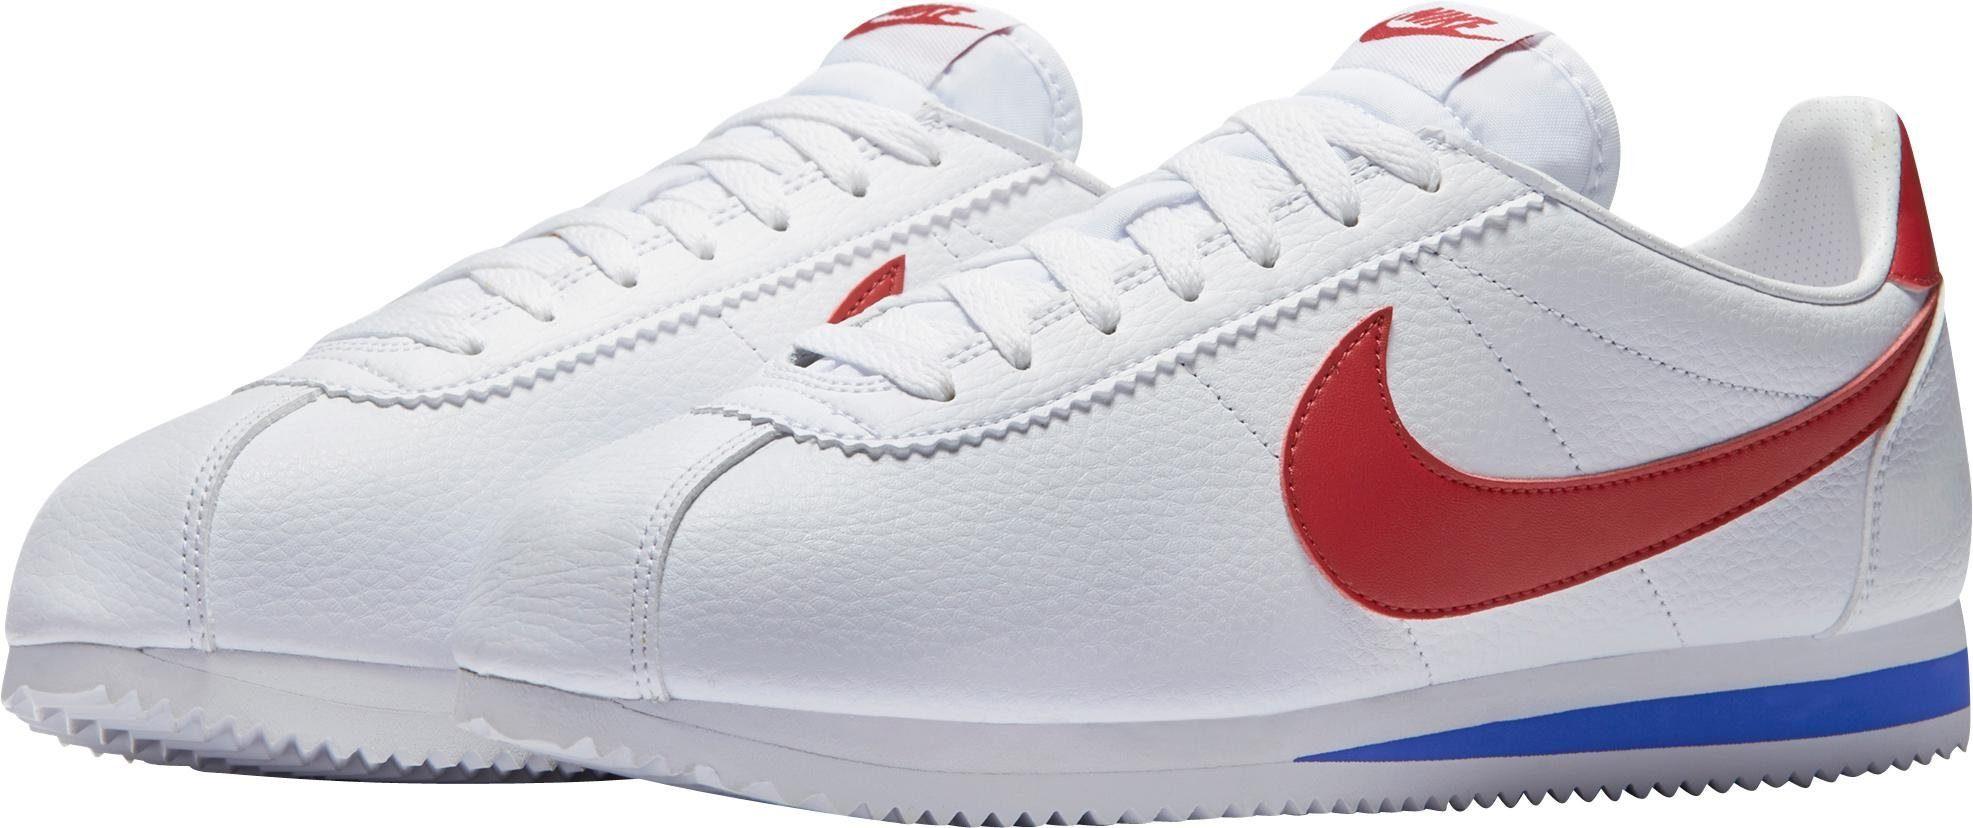 Nike Sportswear »Classic Cortez Leather« Sneaker   OTTO